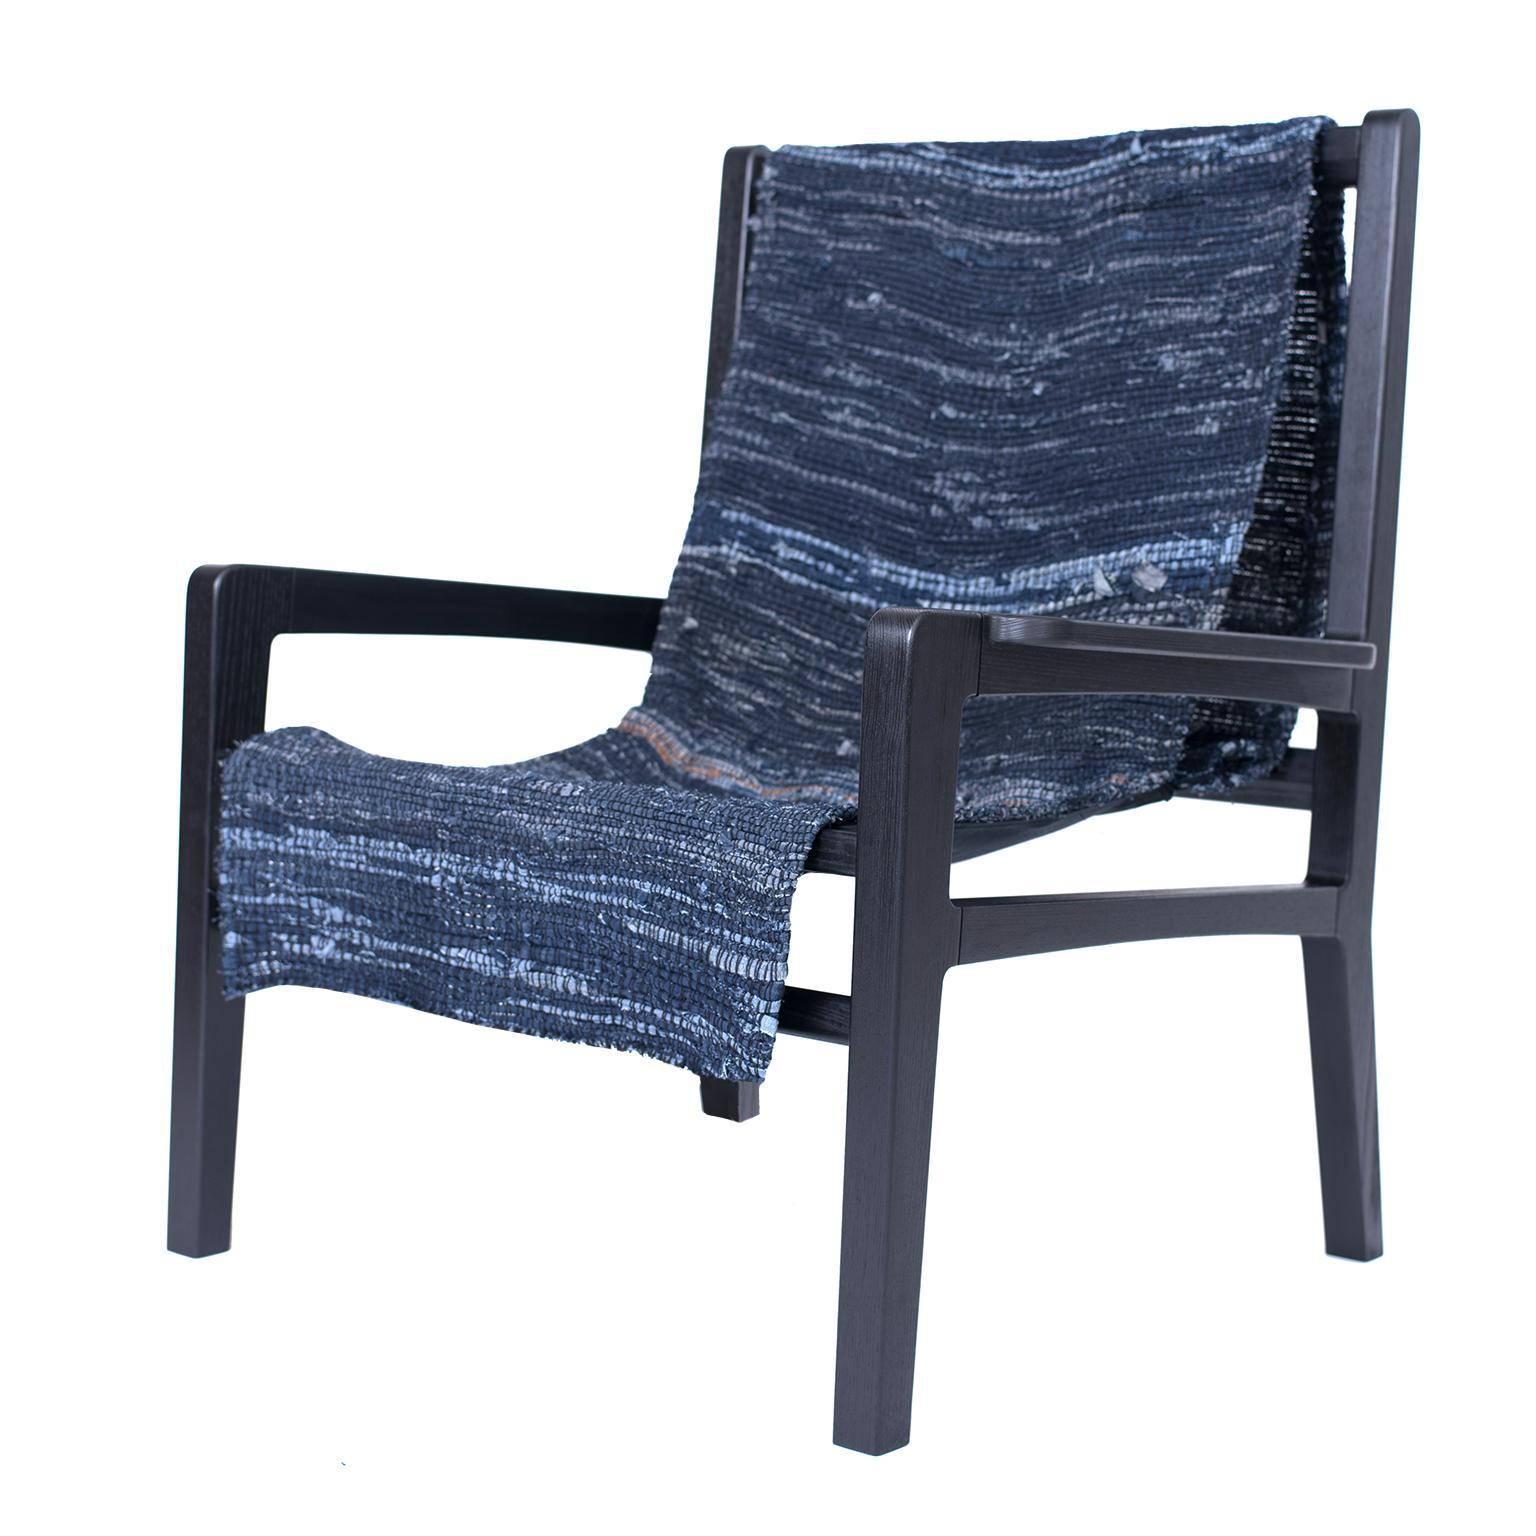 Giacomo Sling Chair, Blackened Ash and Woven Denim Seat